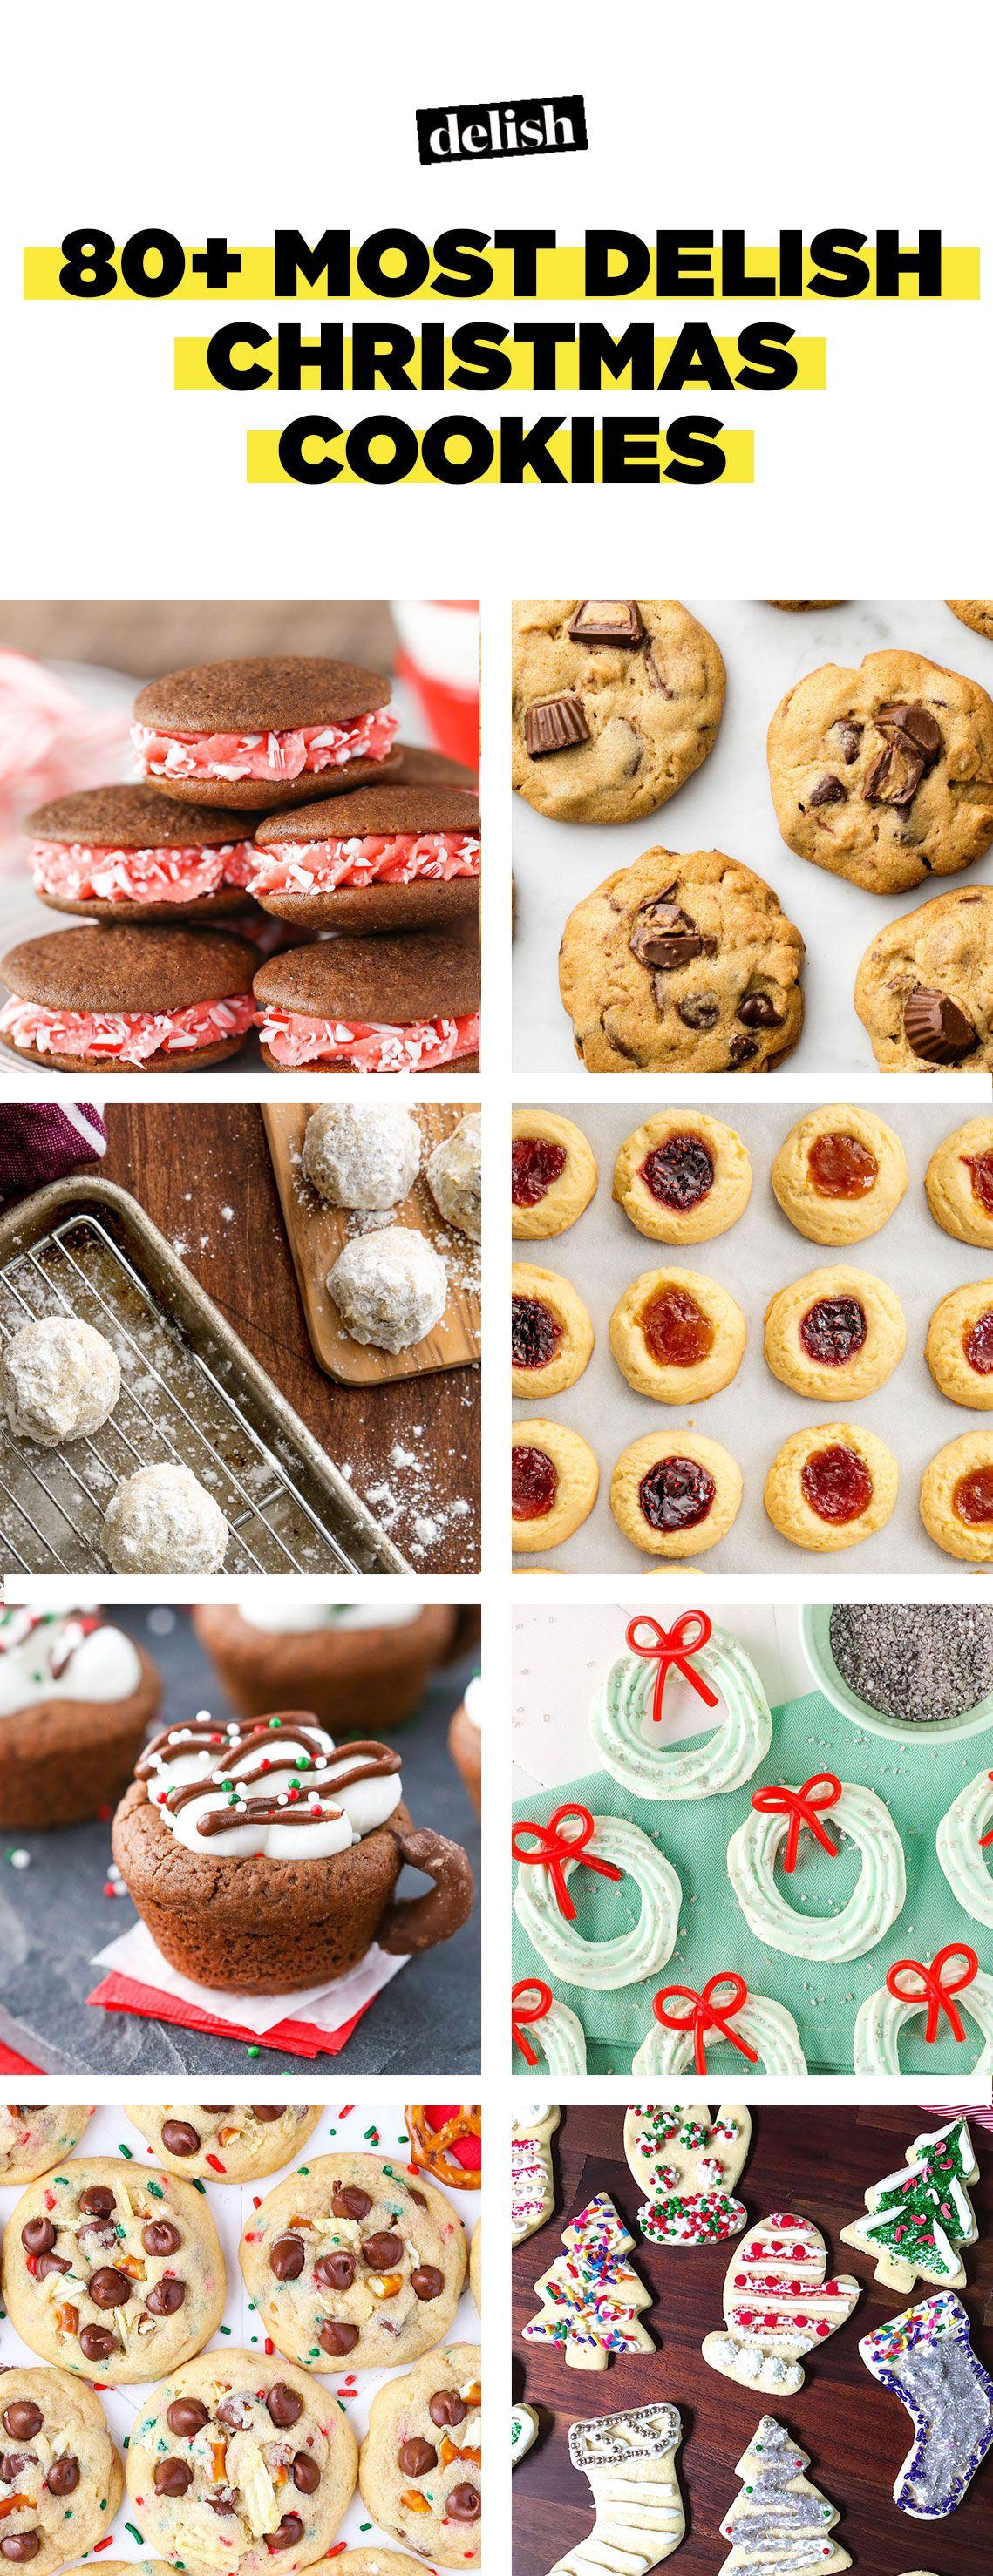 50 easy christmas cookies best recipes for holiday cookiesdelishcom - List Italian Christmas Cookies